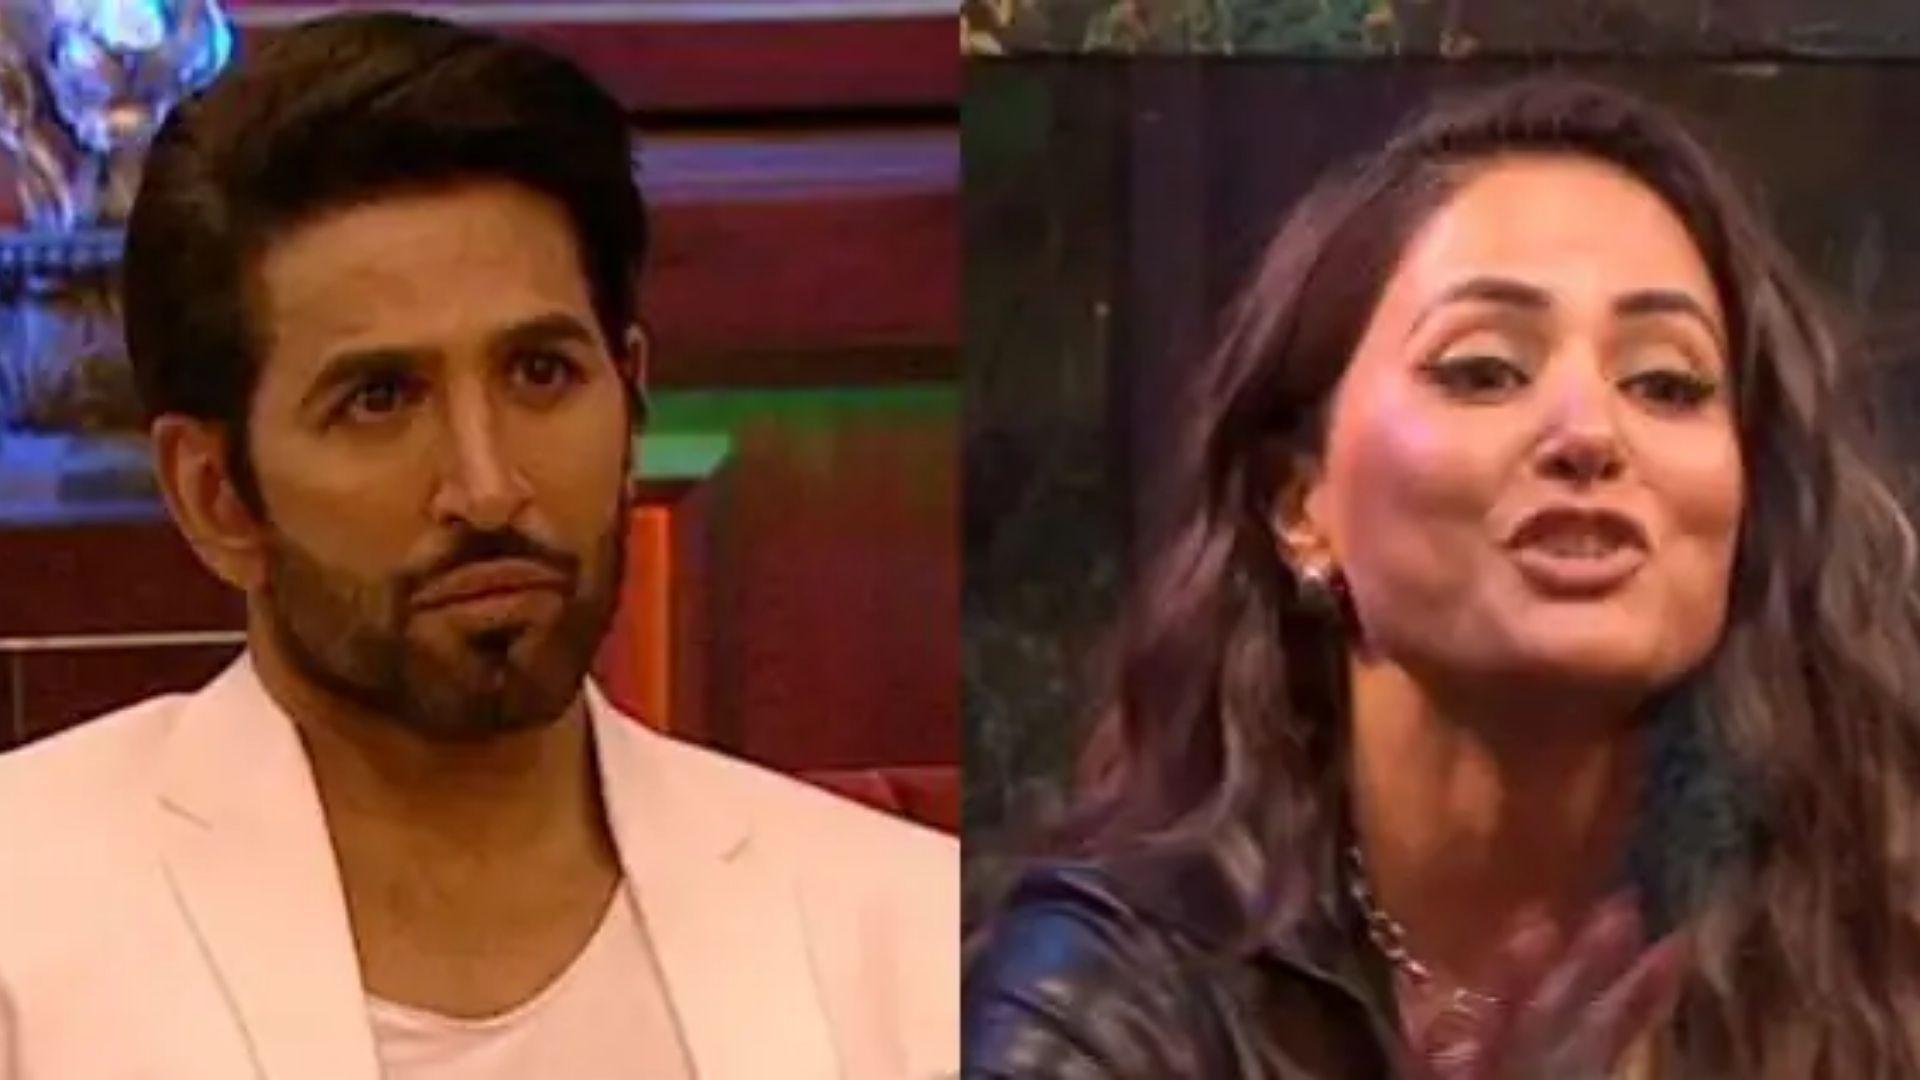 Bigg Boss 15 Weekend Ka Vaar: Fans Slam Vishal Kotian For His Rude Behaviour With Hina Khan